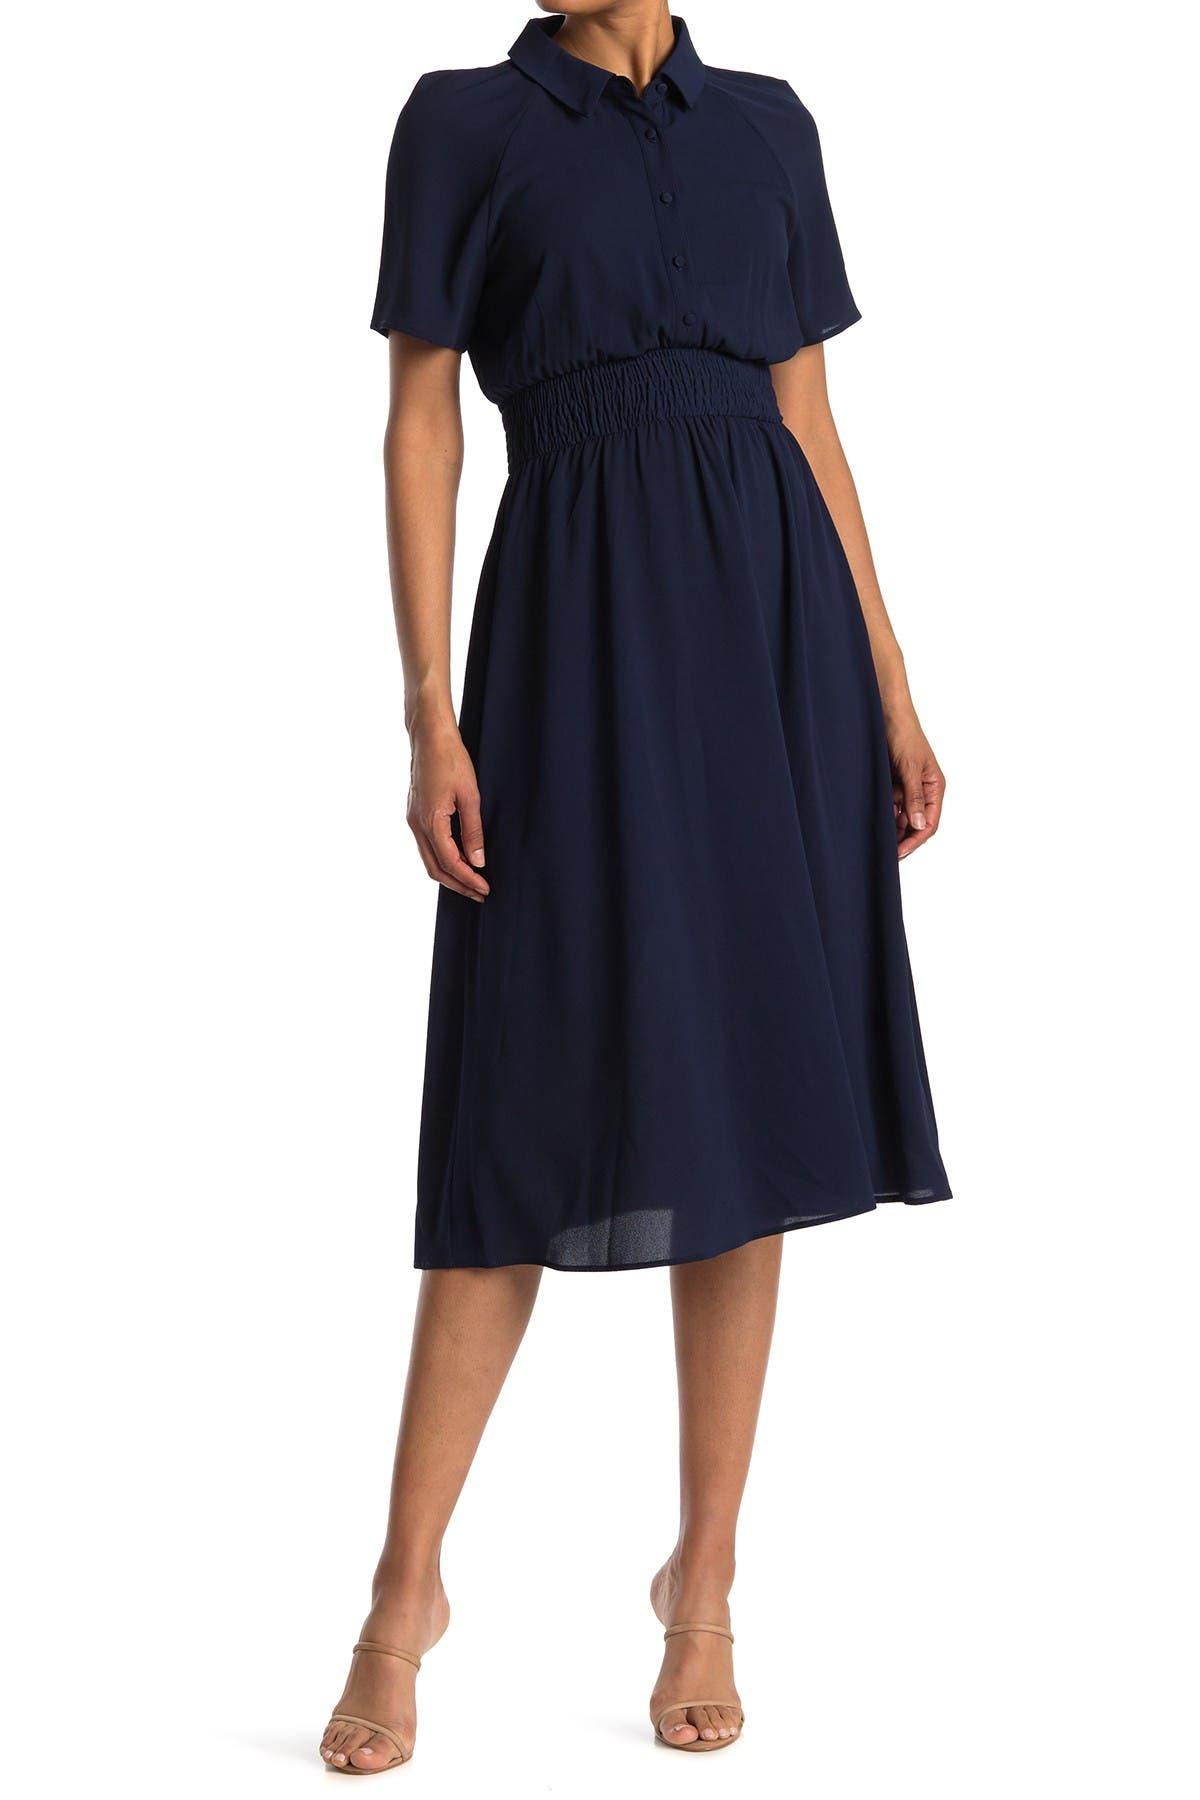 Image of London Times Catalina Short Sleeve Smocked Midi Shirt Dress